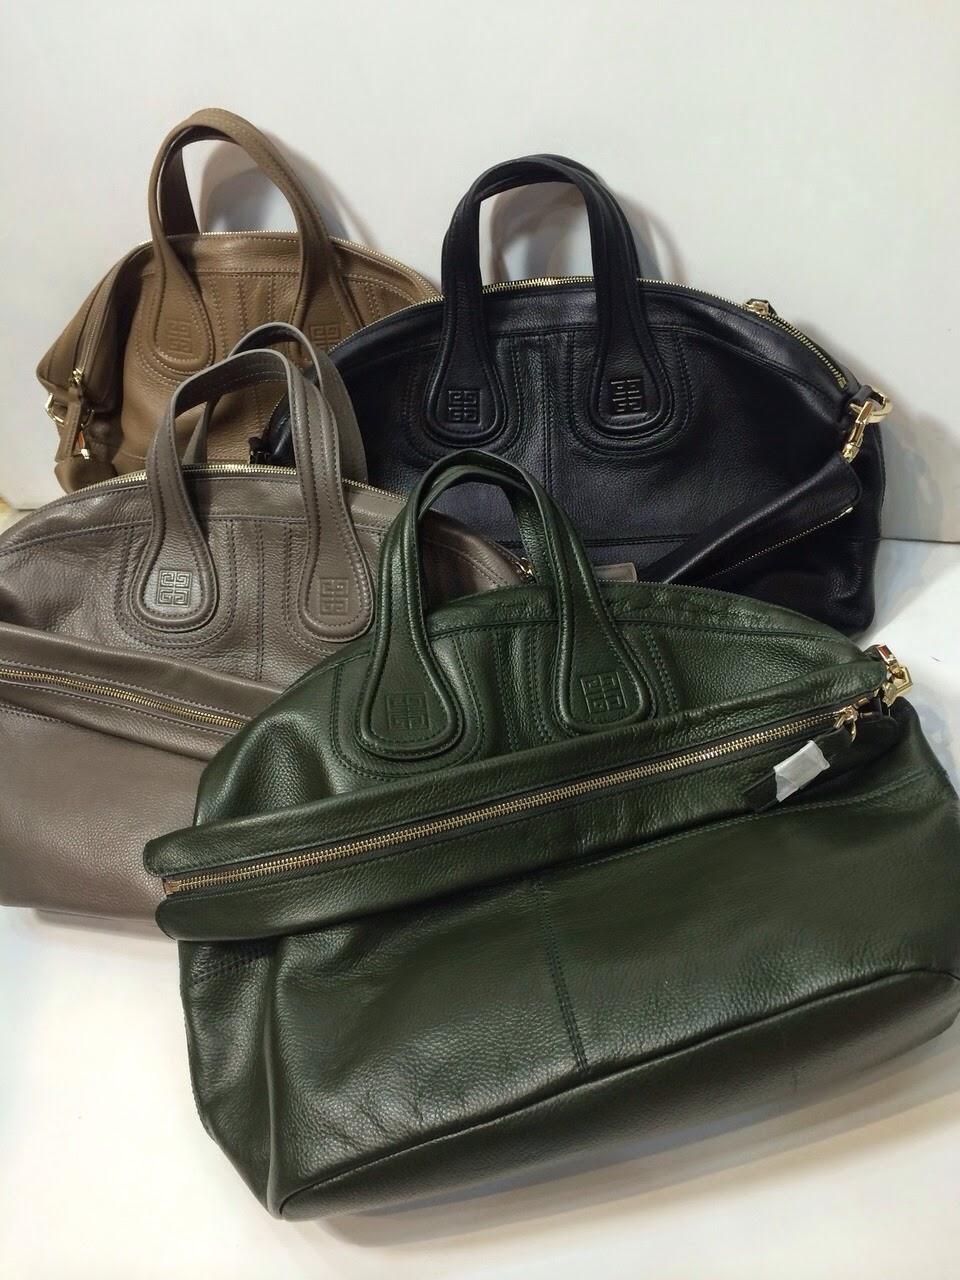 a3b0522e7762ad Givenchy Nightingale Premium Original Leather Bag IDR 4,000,000 ...